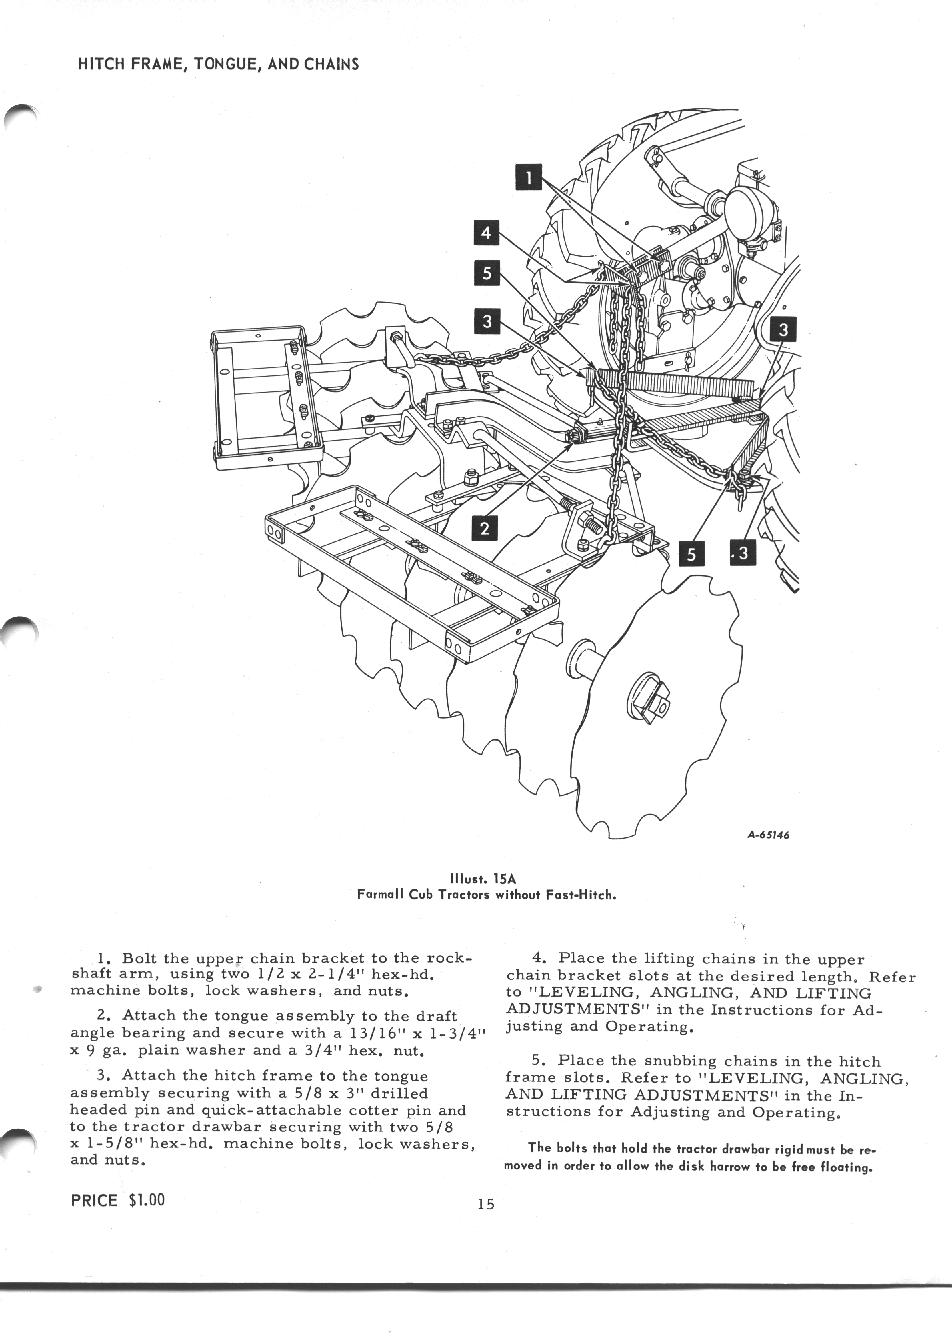 Cub-L 38 Disc Harrow Manual